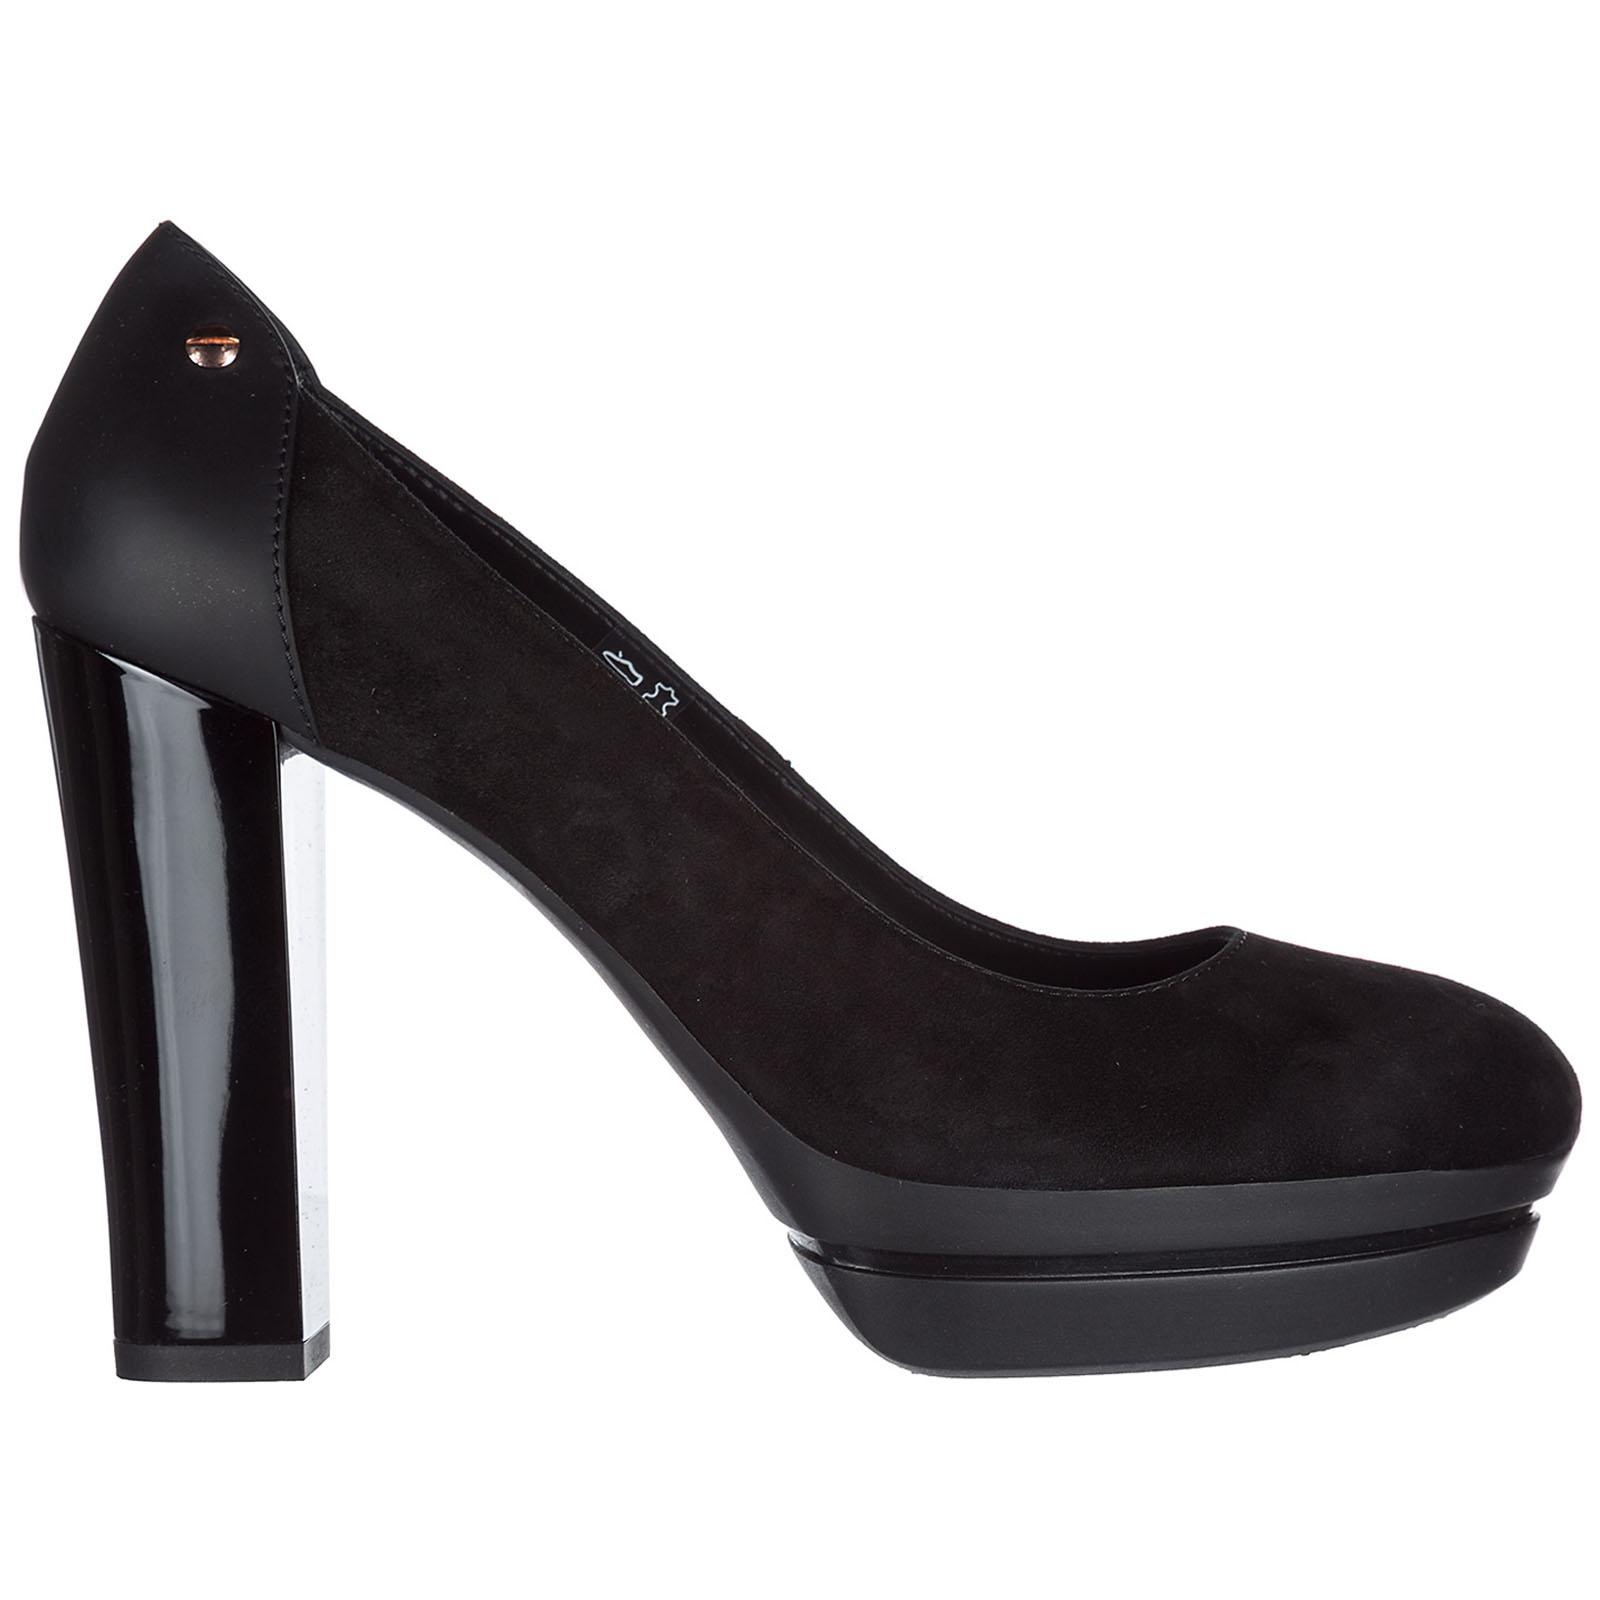 Decolletes decoltè scarpe donna con tacco camoscio h313